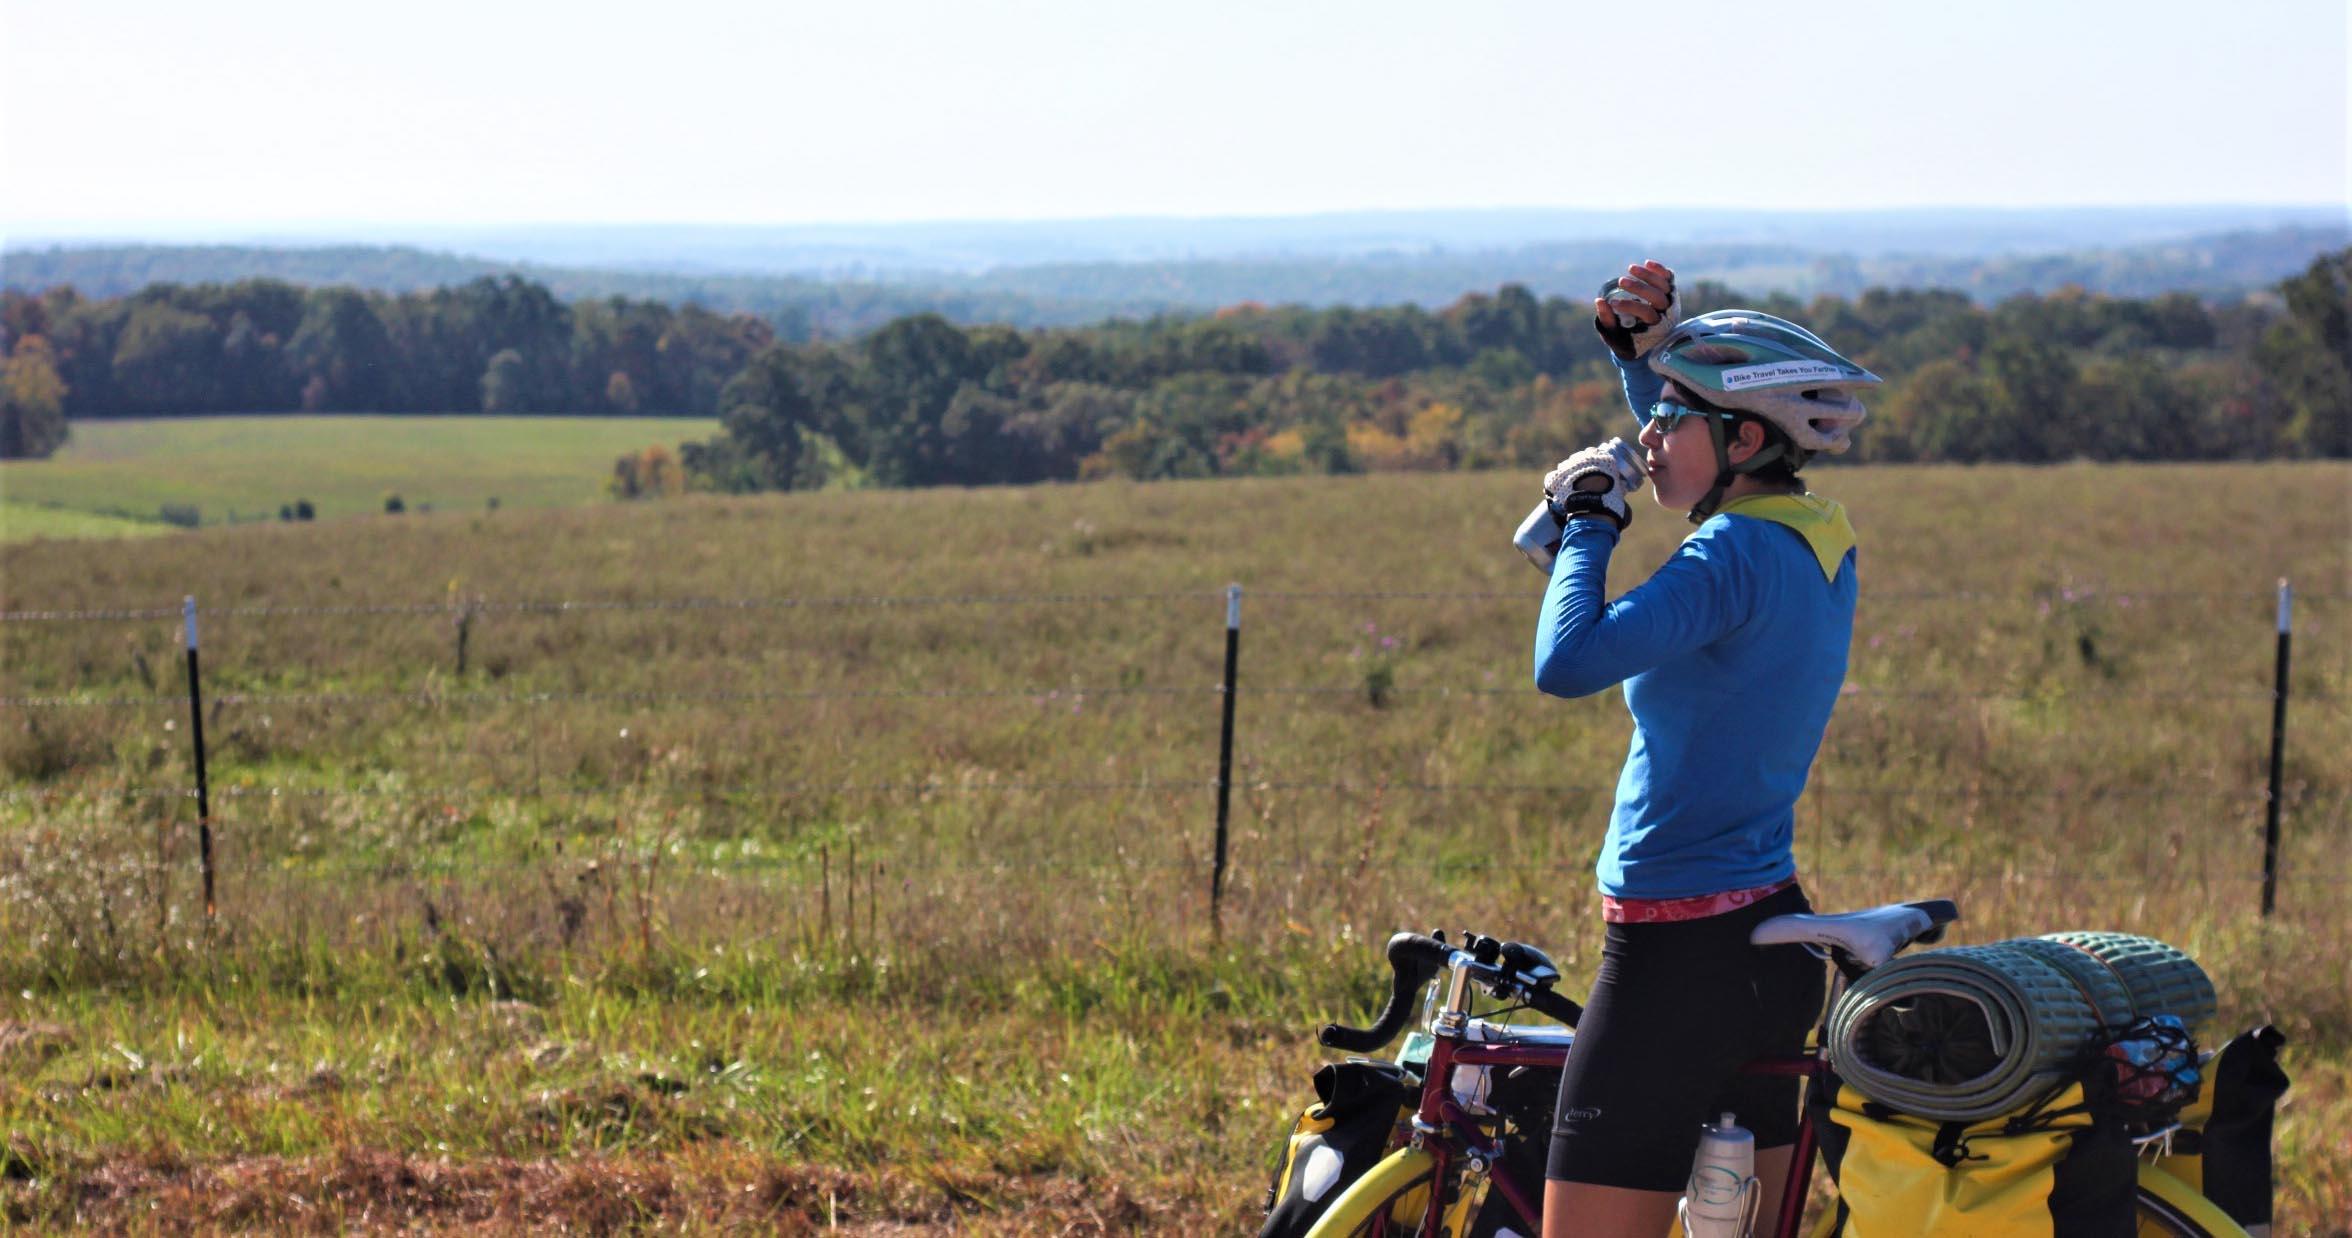 Olivia Round on her bike trip from Oregon to Florida. (Photo courtesy Olivia Round)